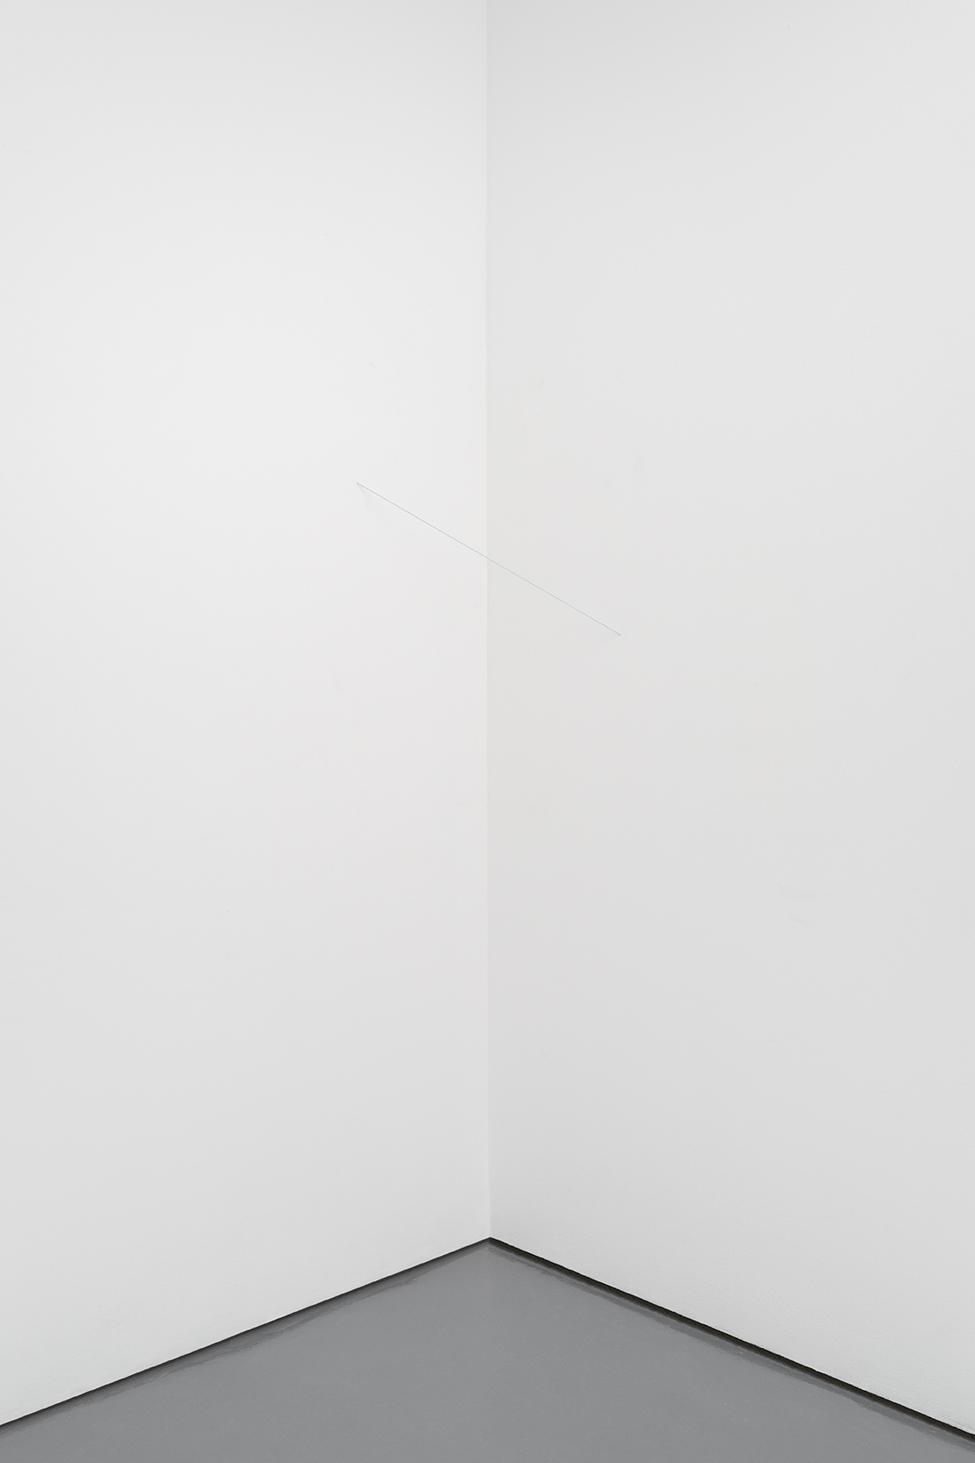 Untitled (Green Corner)